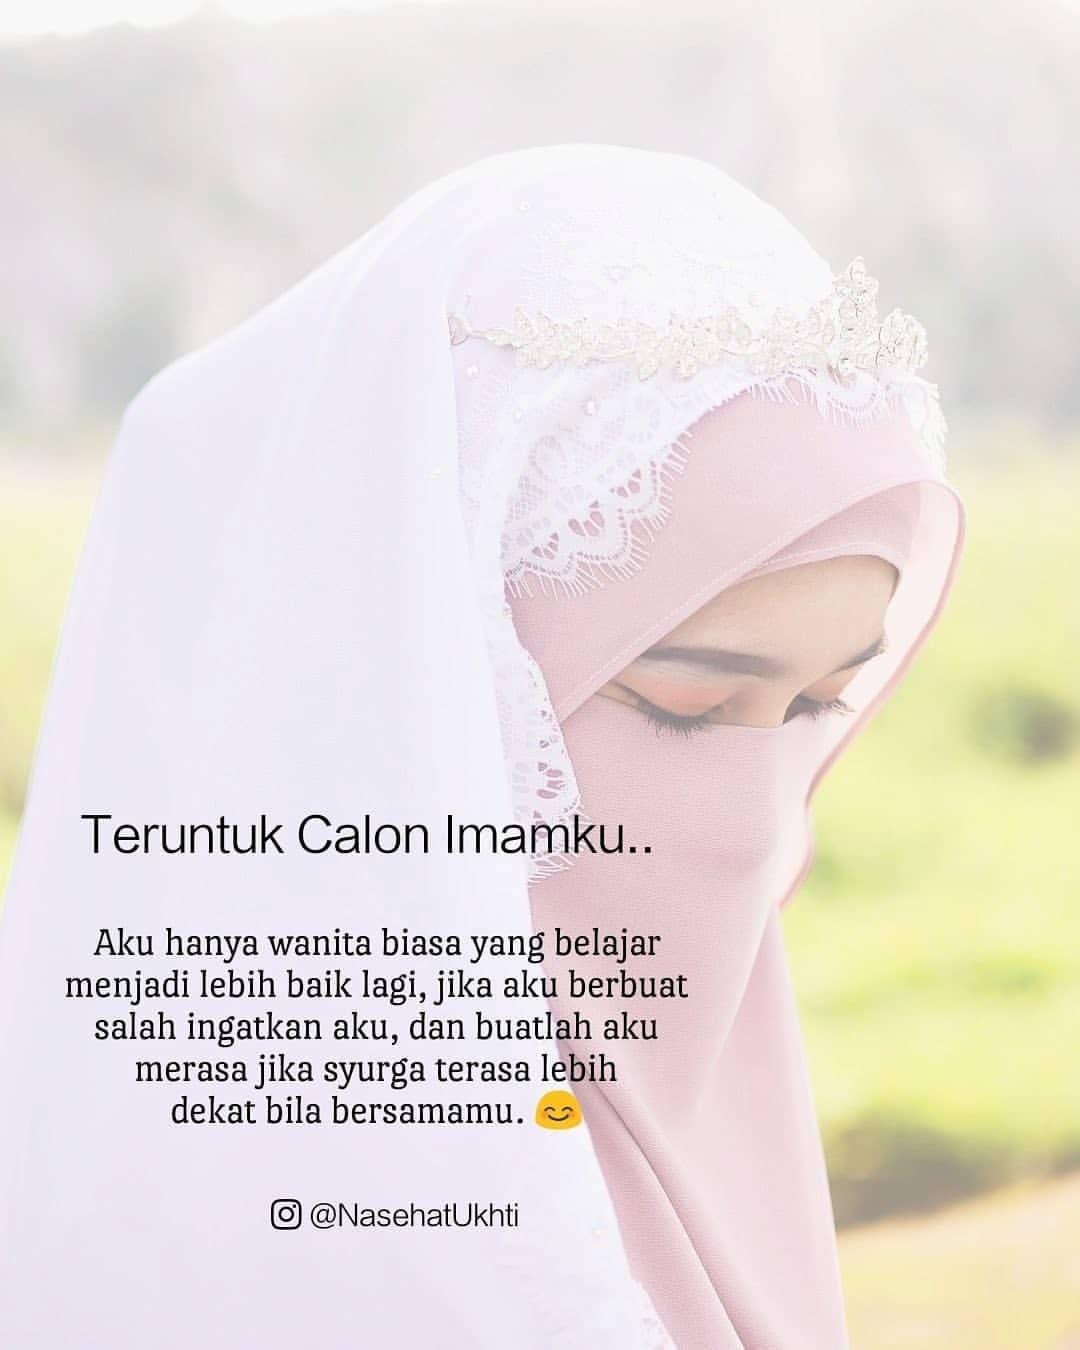 Puisi Islami Tentang Imam (suami) Tercinta Dan Puisi Calon